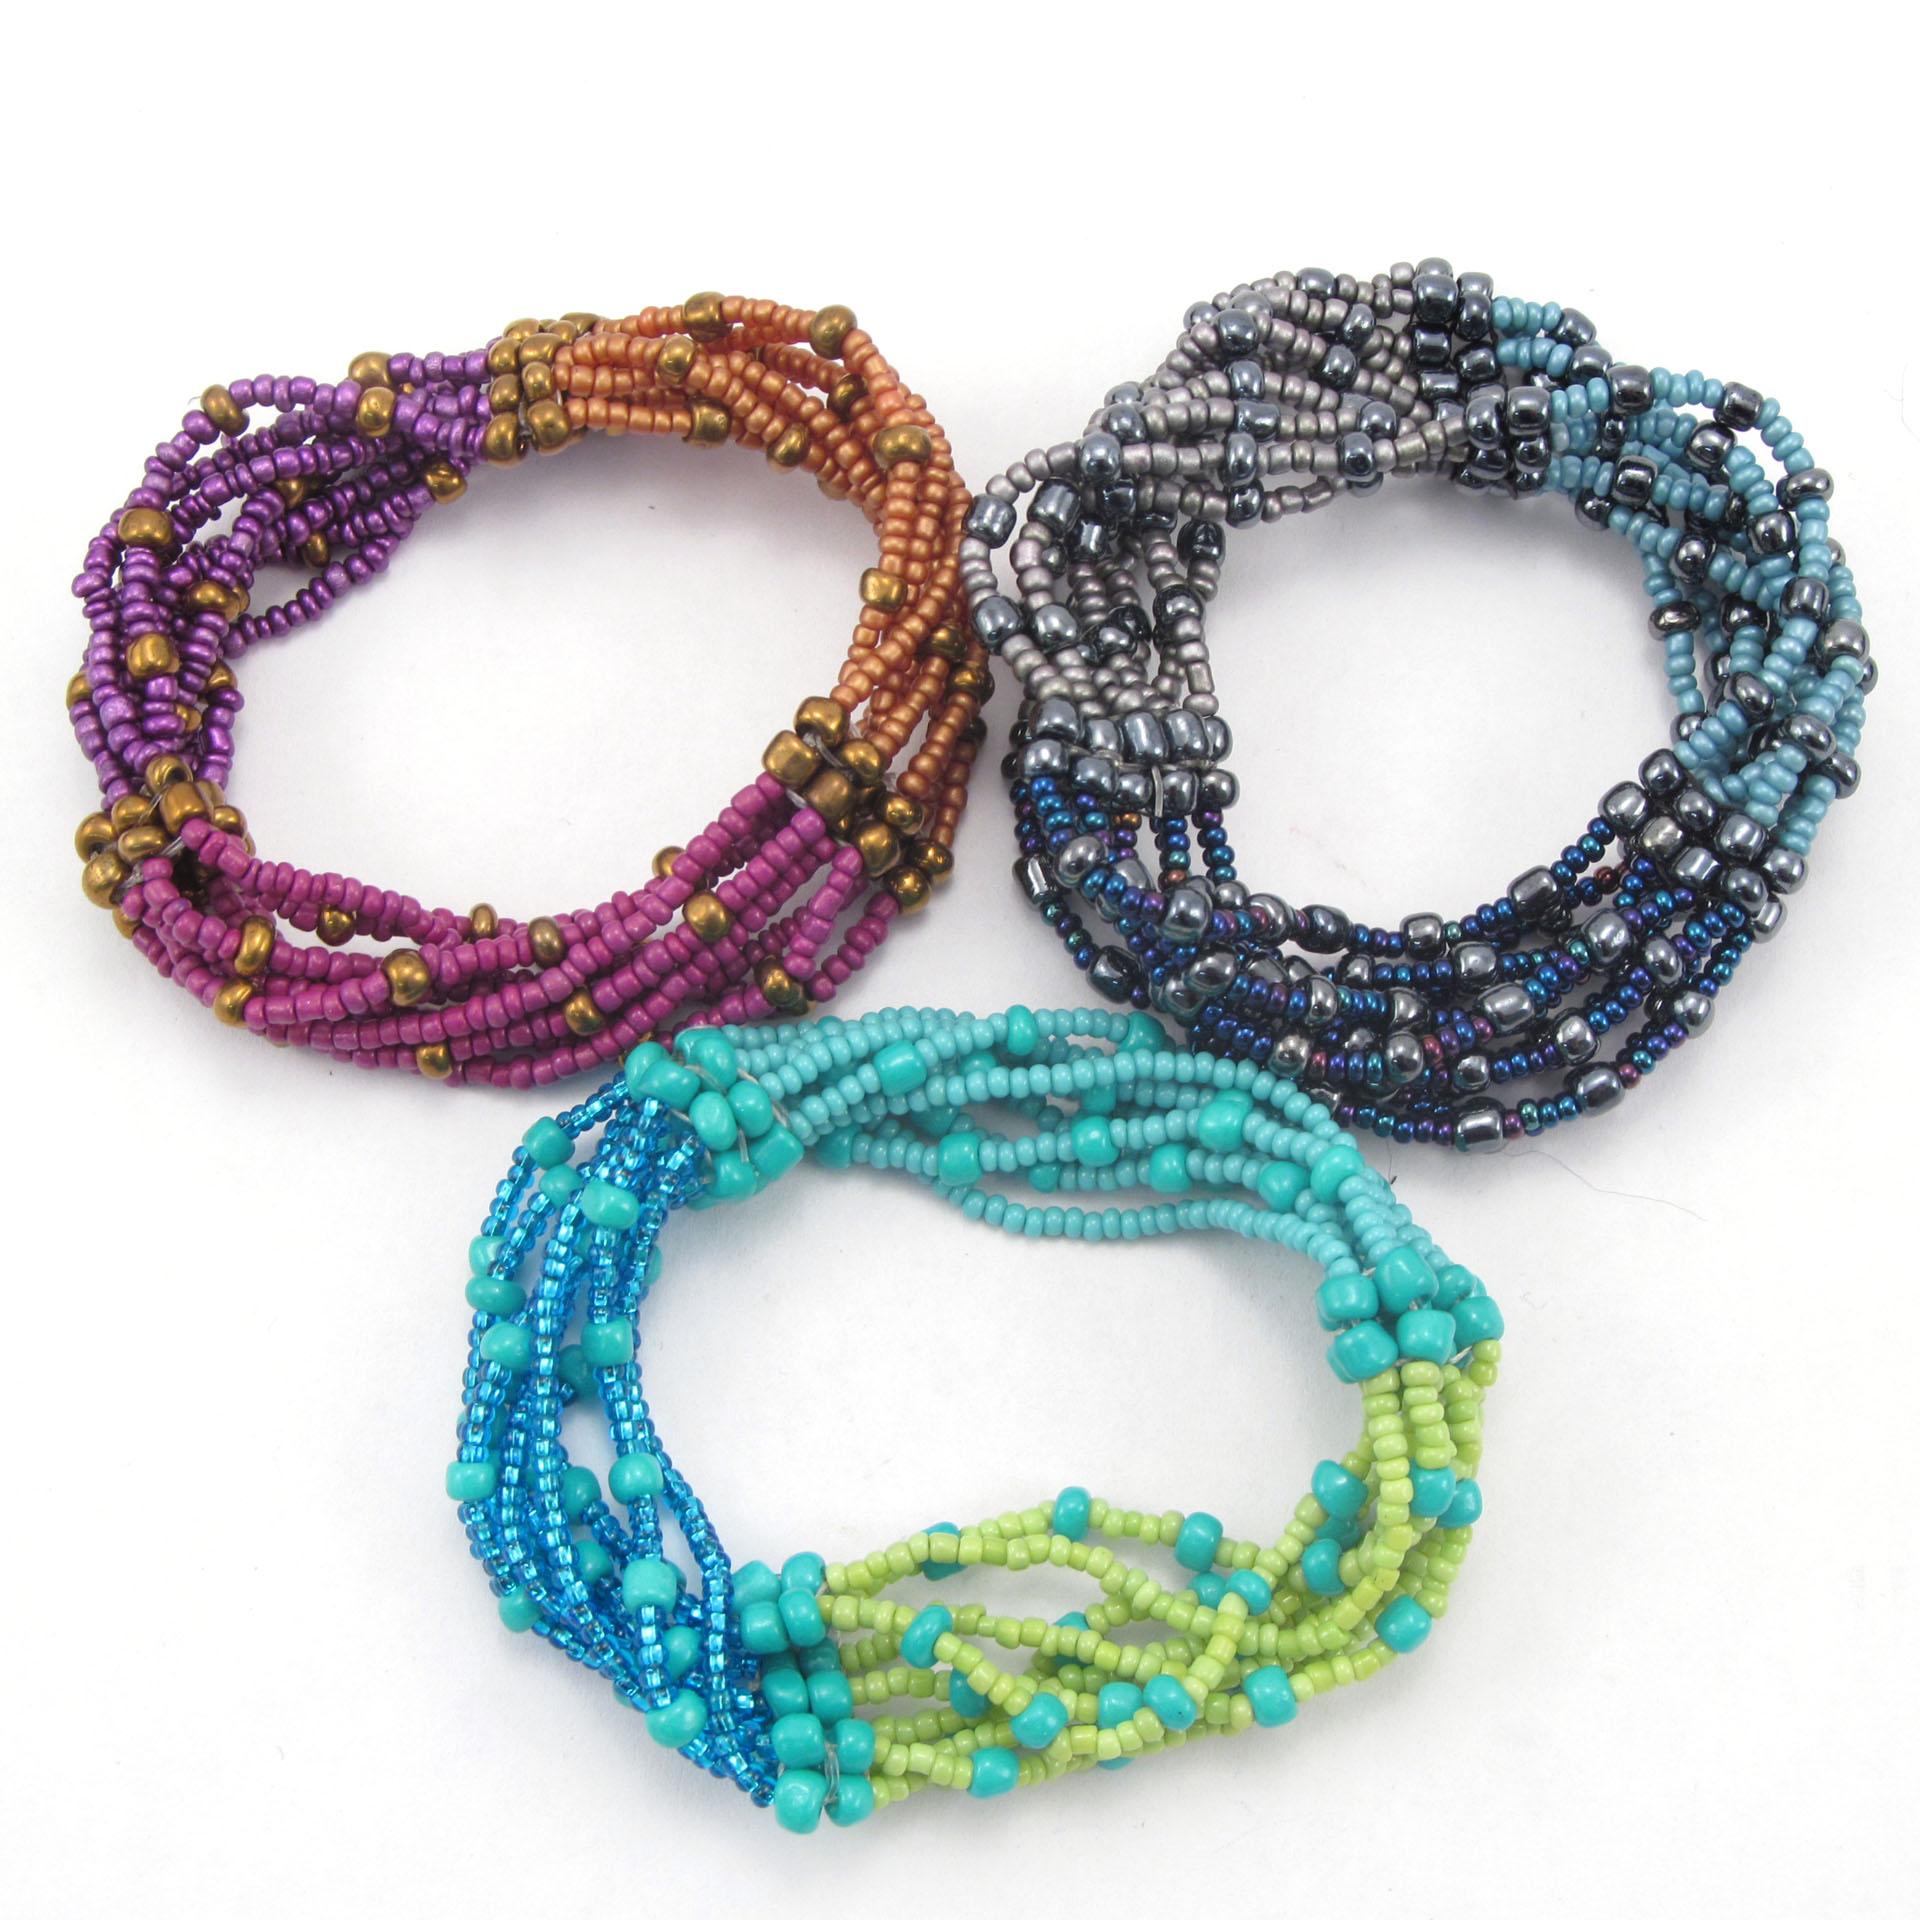 Handmade Guatemalan Fair Trade Bracelets La Playa Collection